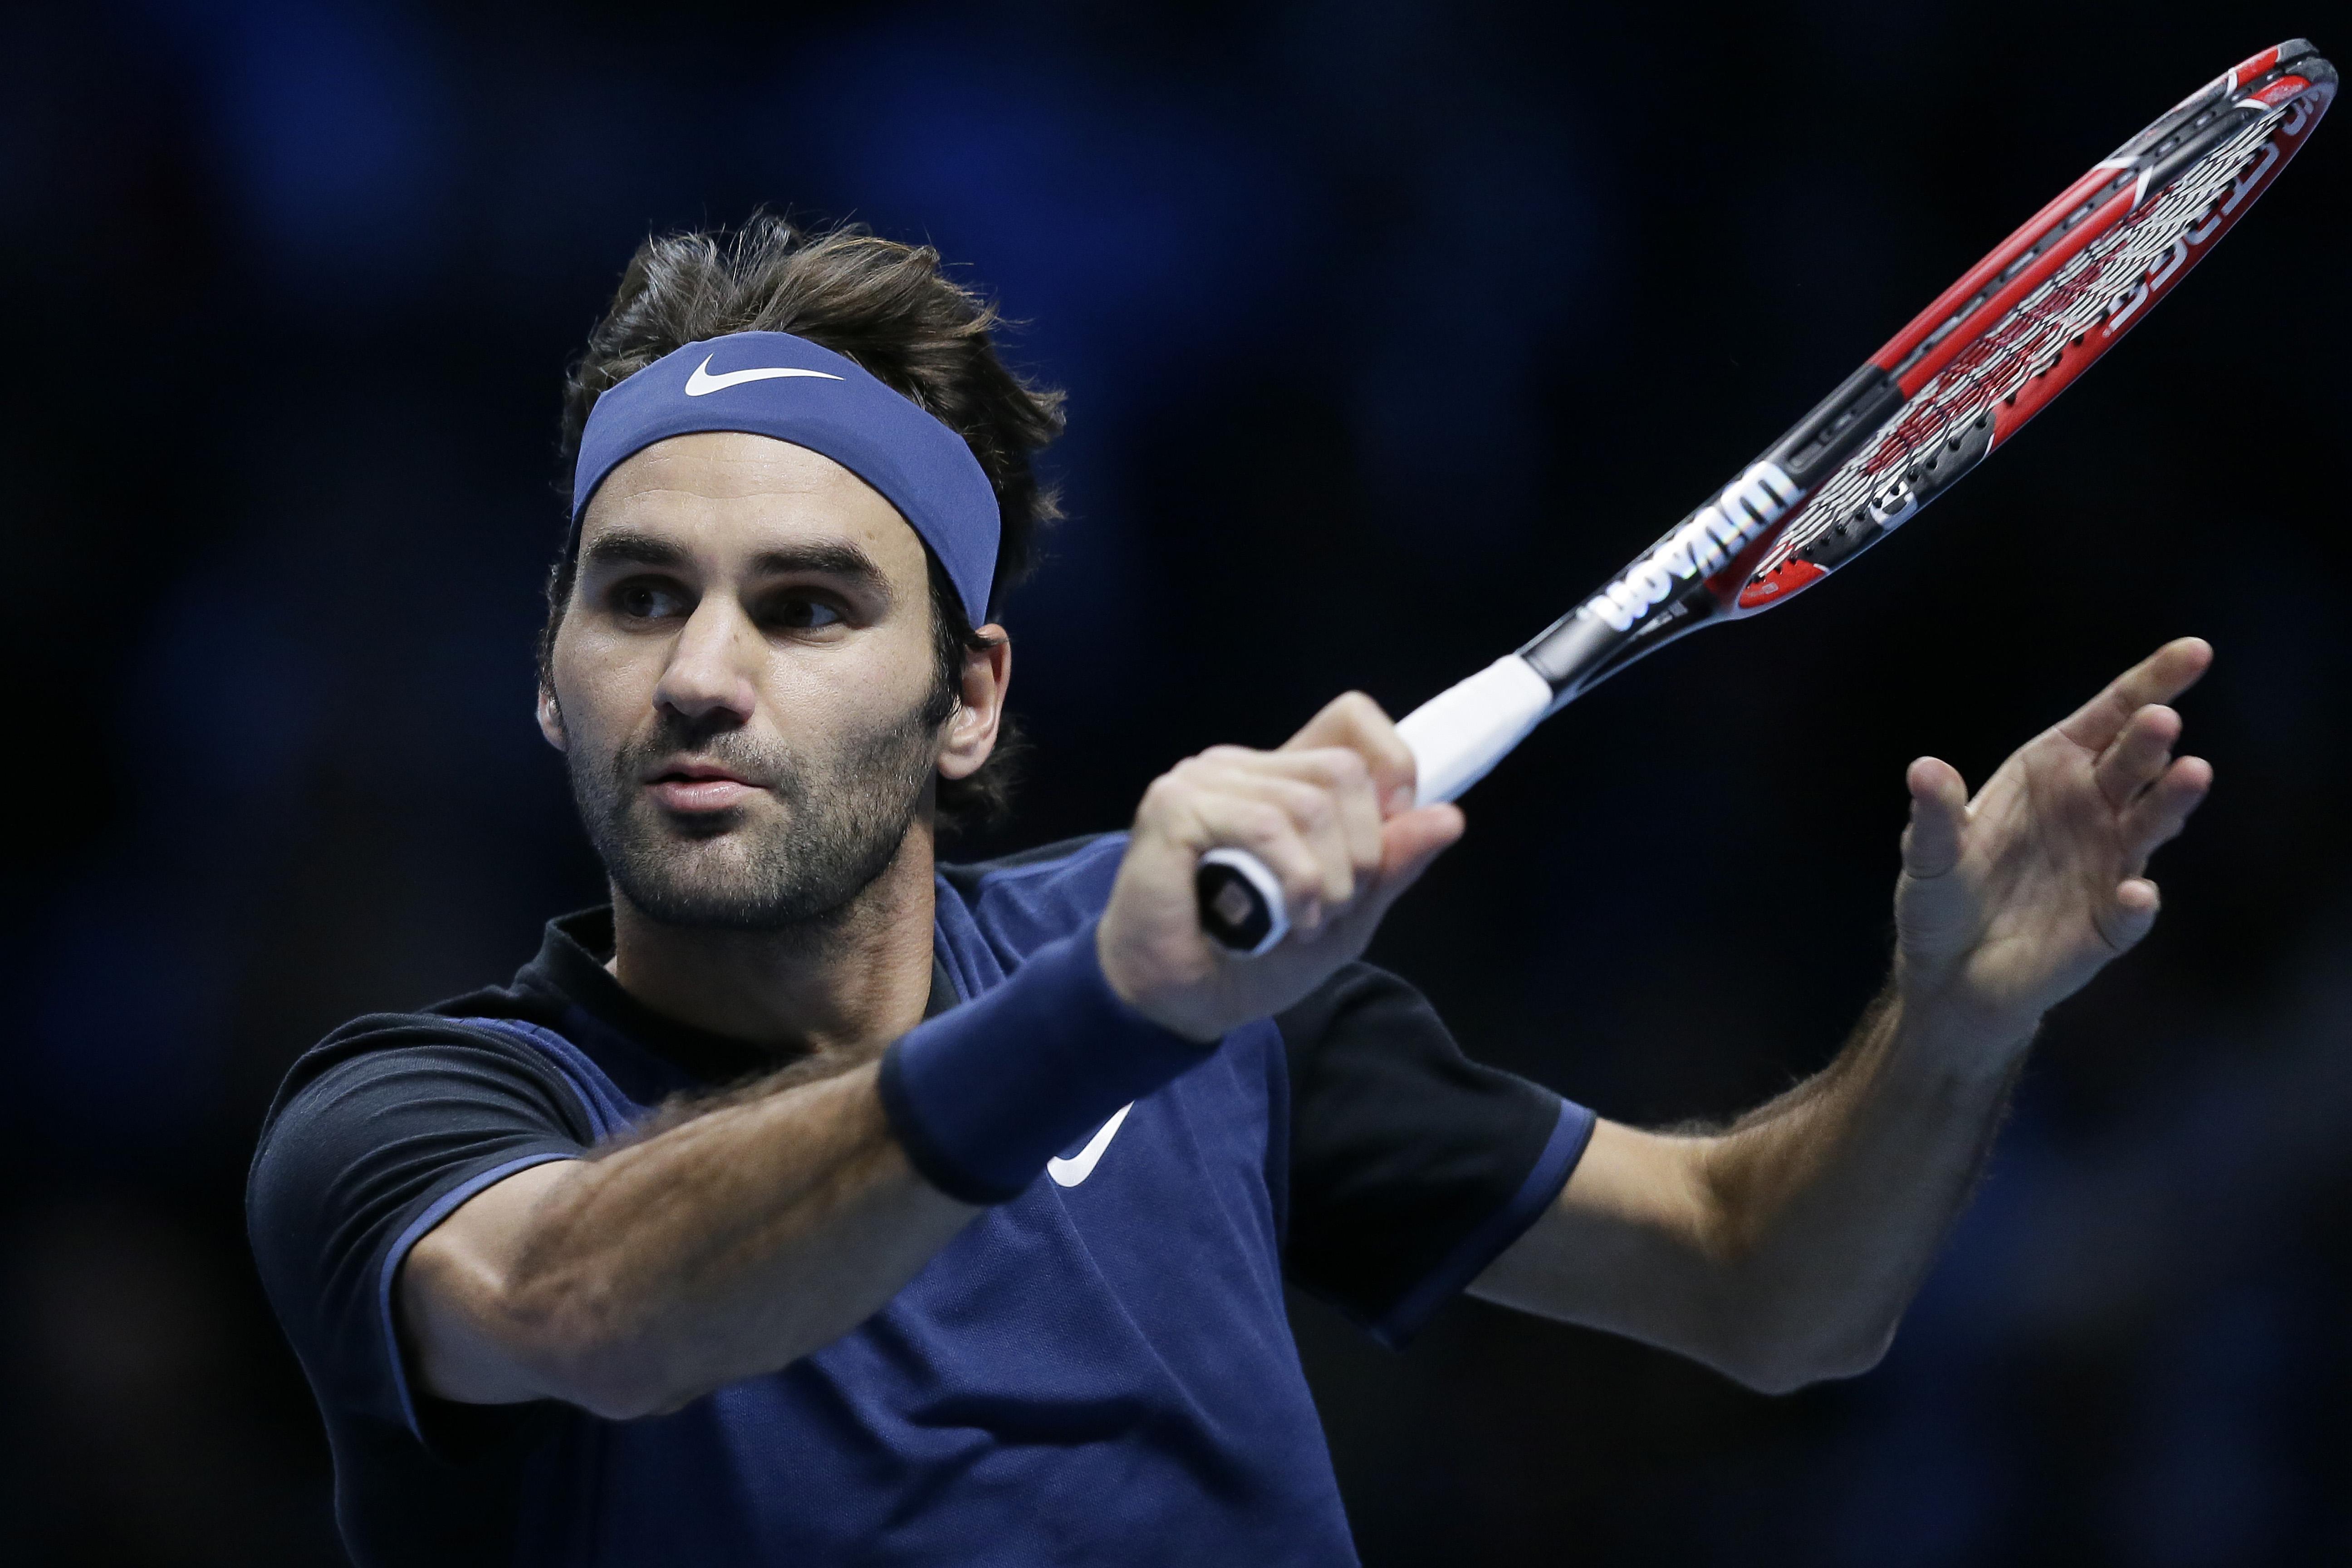 Switzerland's Roger Federer plays a return to Switzerland's Stan Wawrinka during their ATP World Tour Finals semifinal tennis match at the O2 Arena in London, Saturday Nov. 21, 2015. (AP Photo/Tim Ireland)